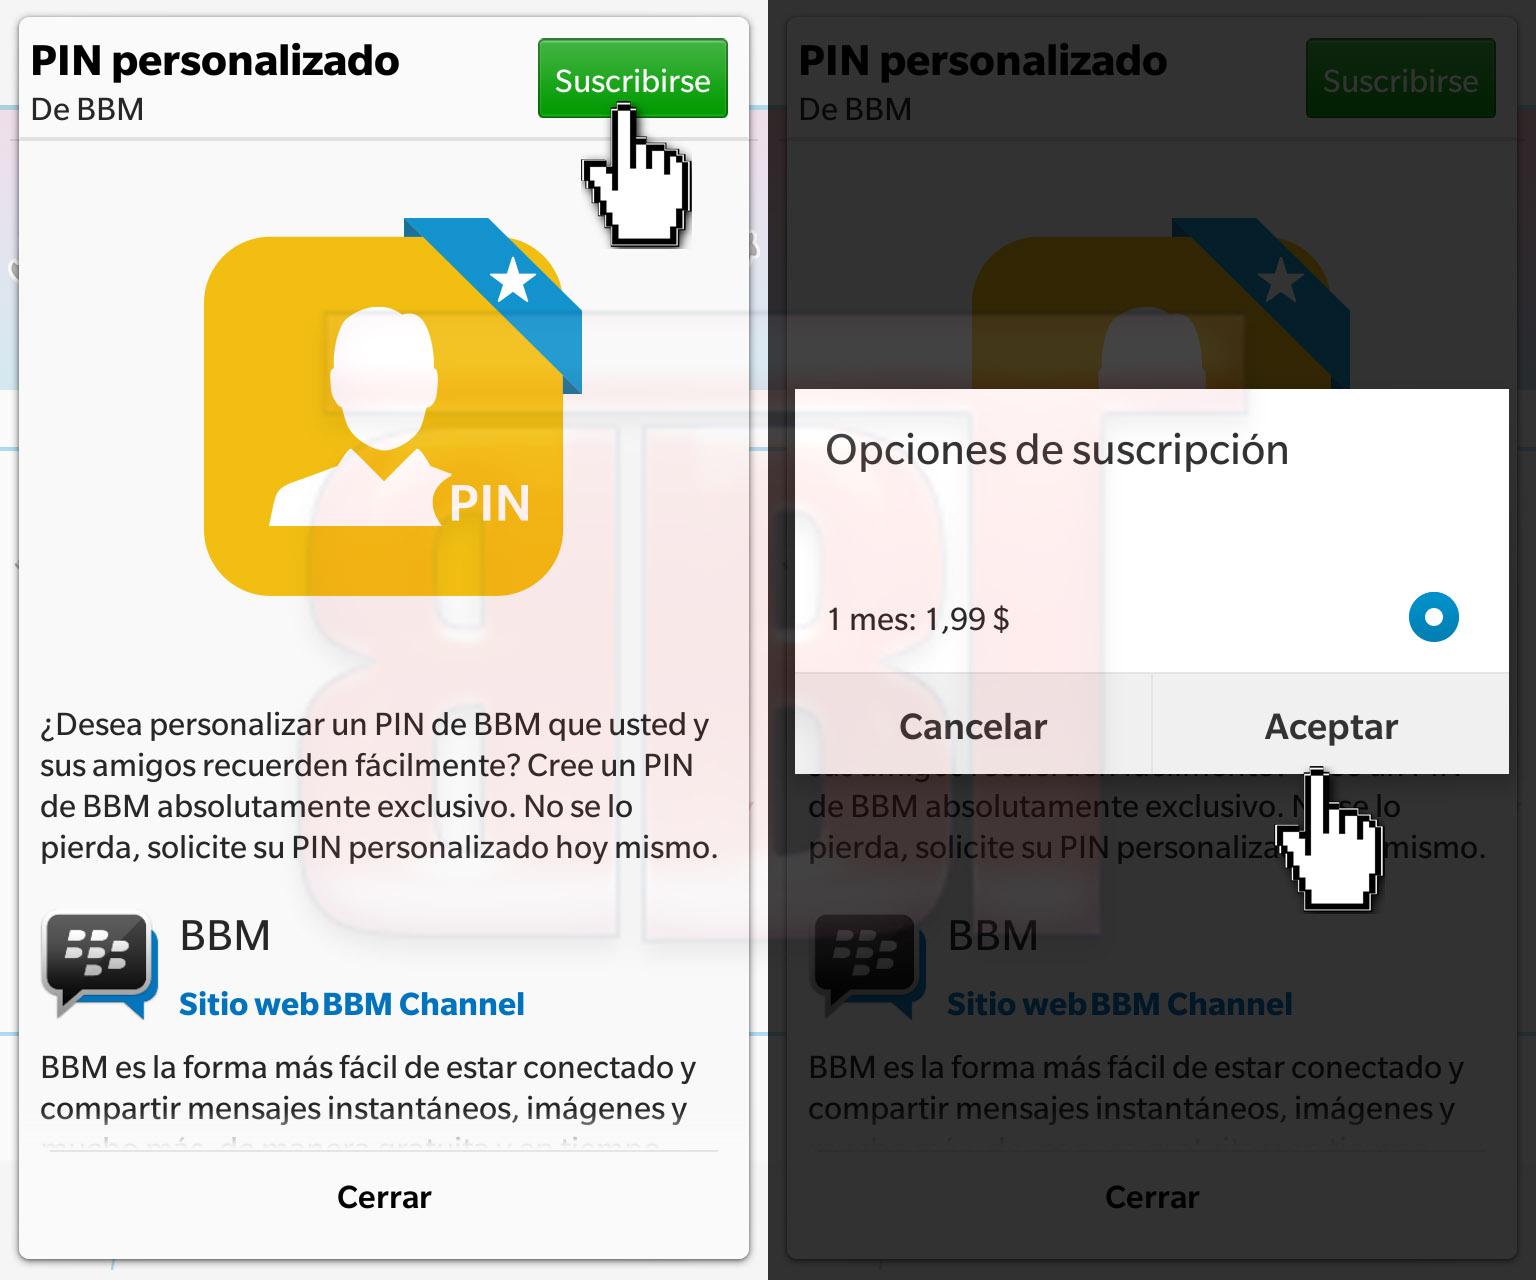 pin_personalizado